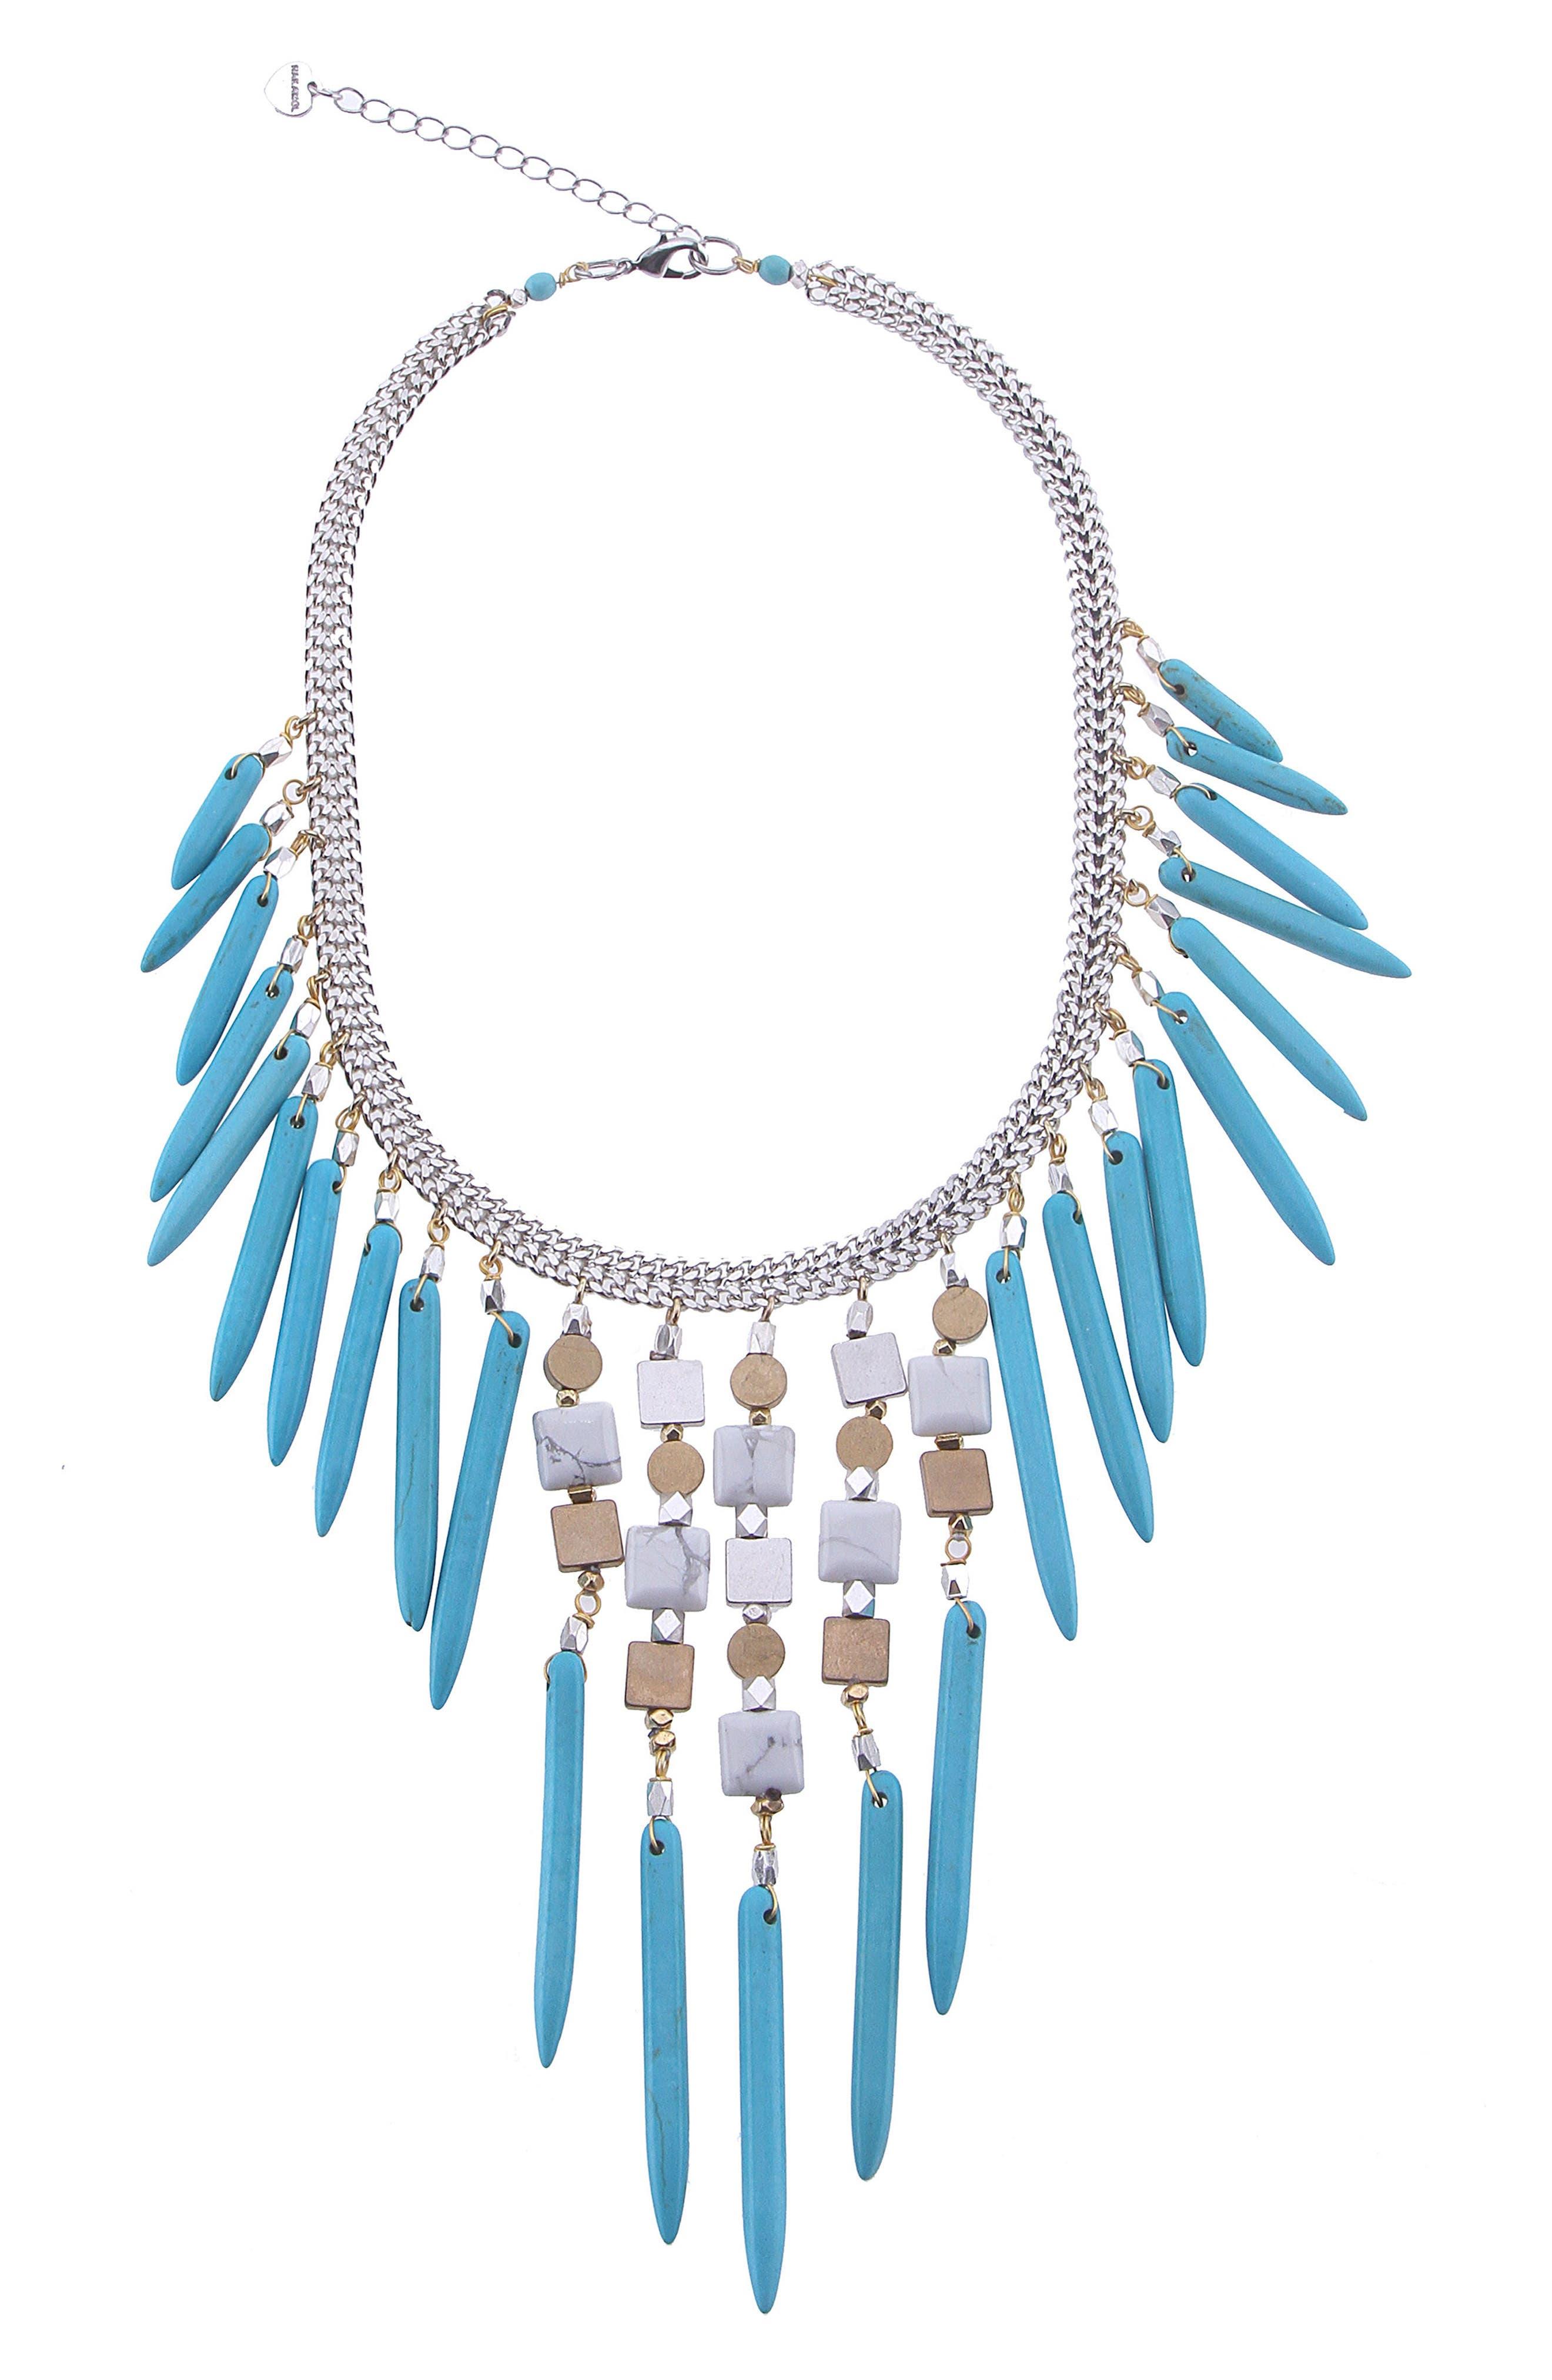 Fringe Magnesite & Howlite Collar Necklace,                             Main thumbnail 1, color,                             Turquoise